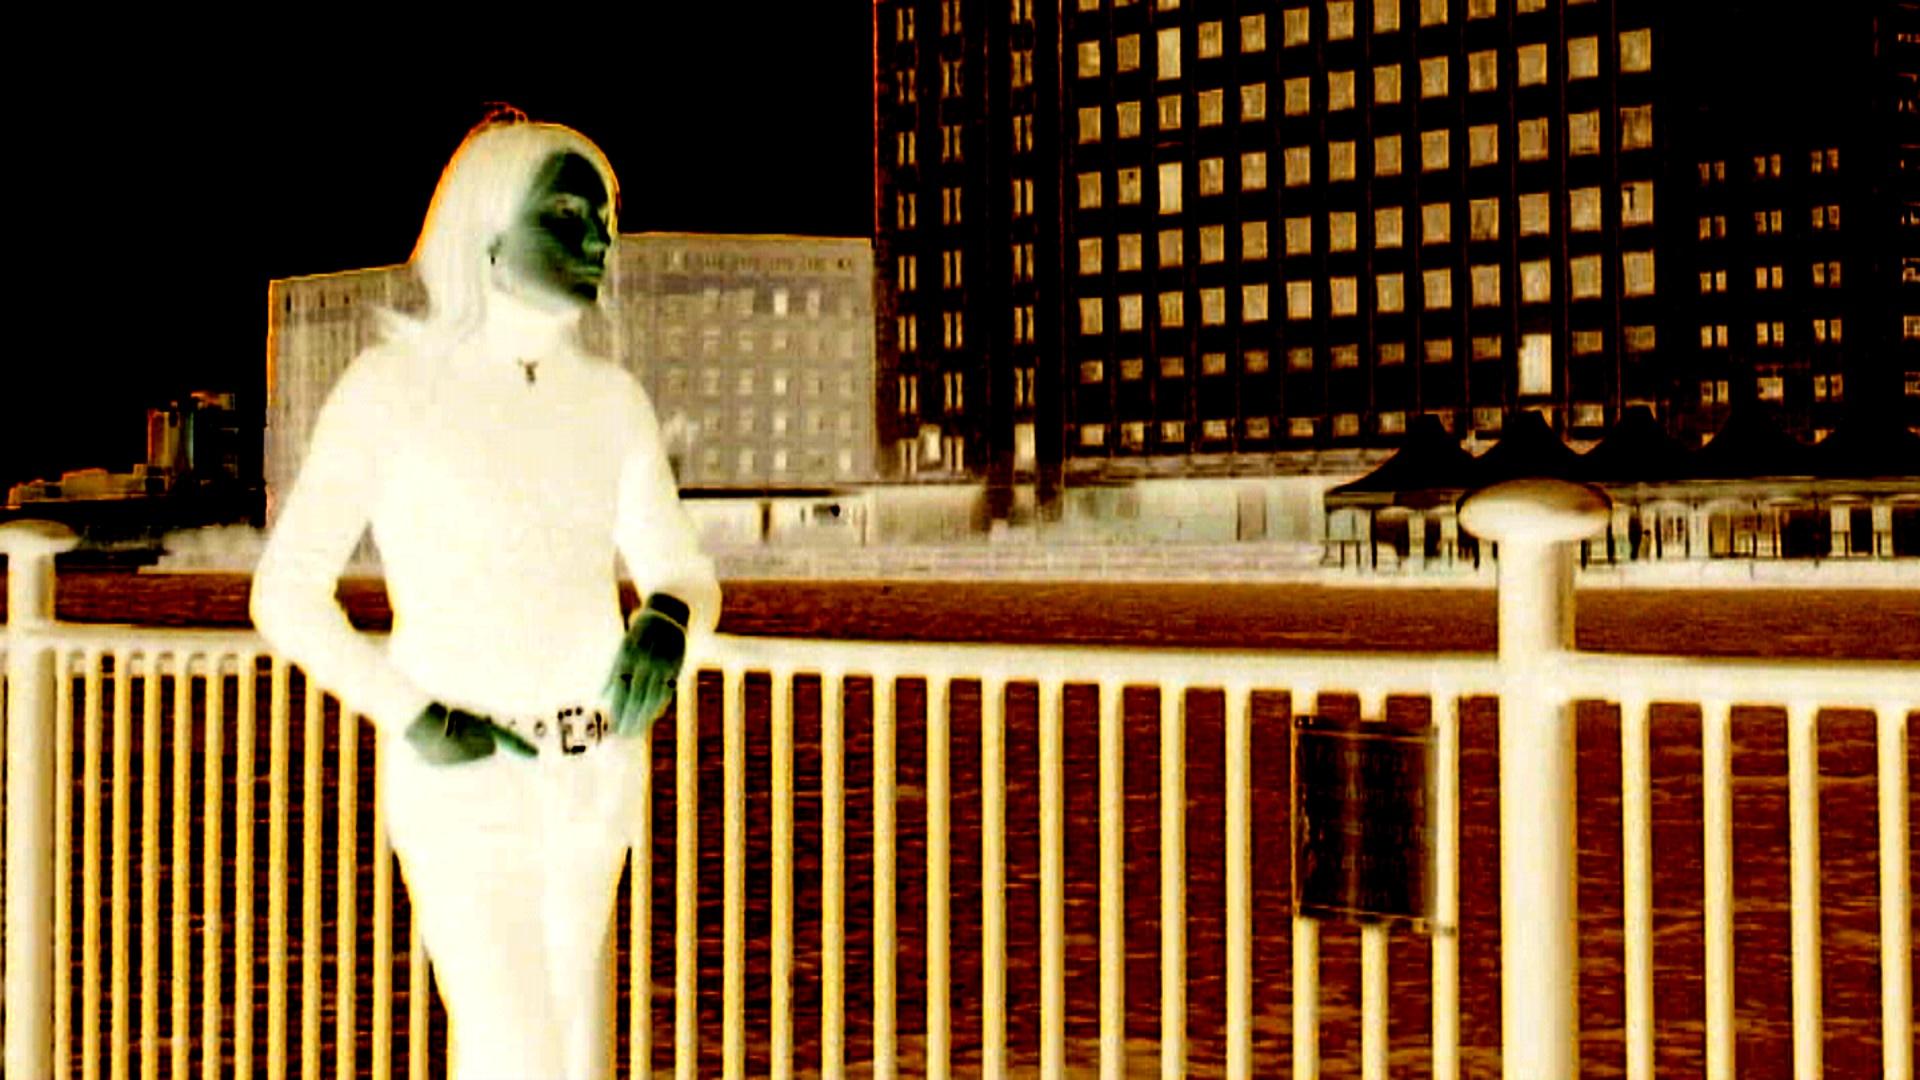 Rohan Quine, 'The Imagination Thief' - film 'MARC 5', still 6